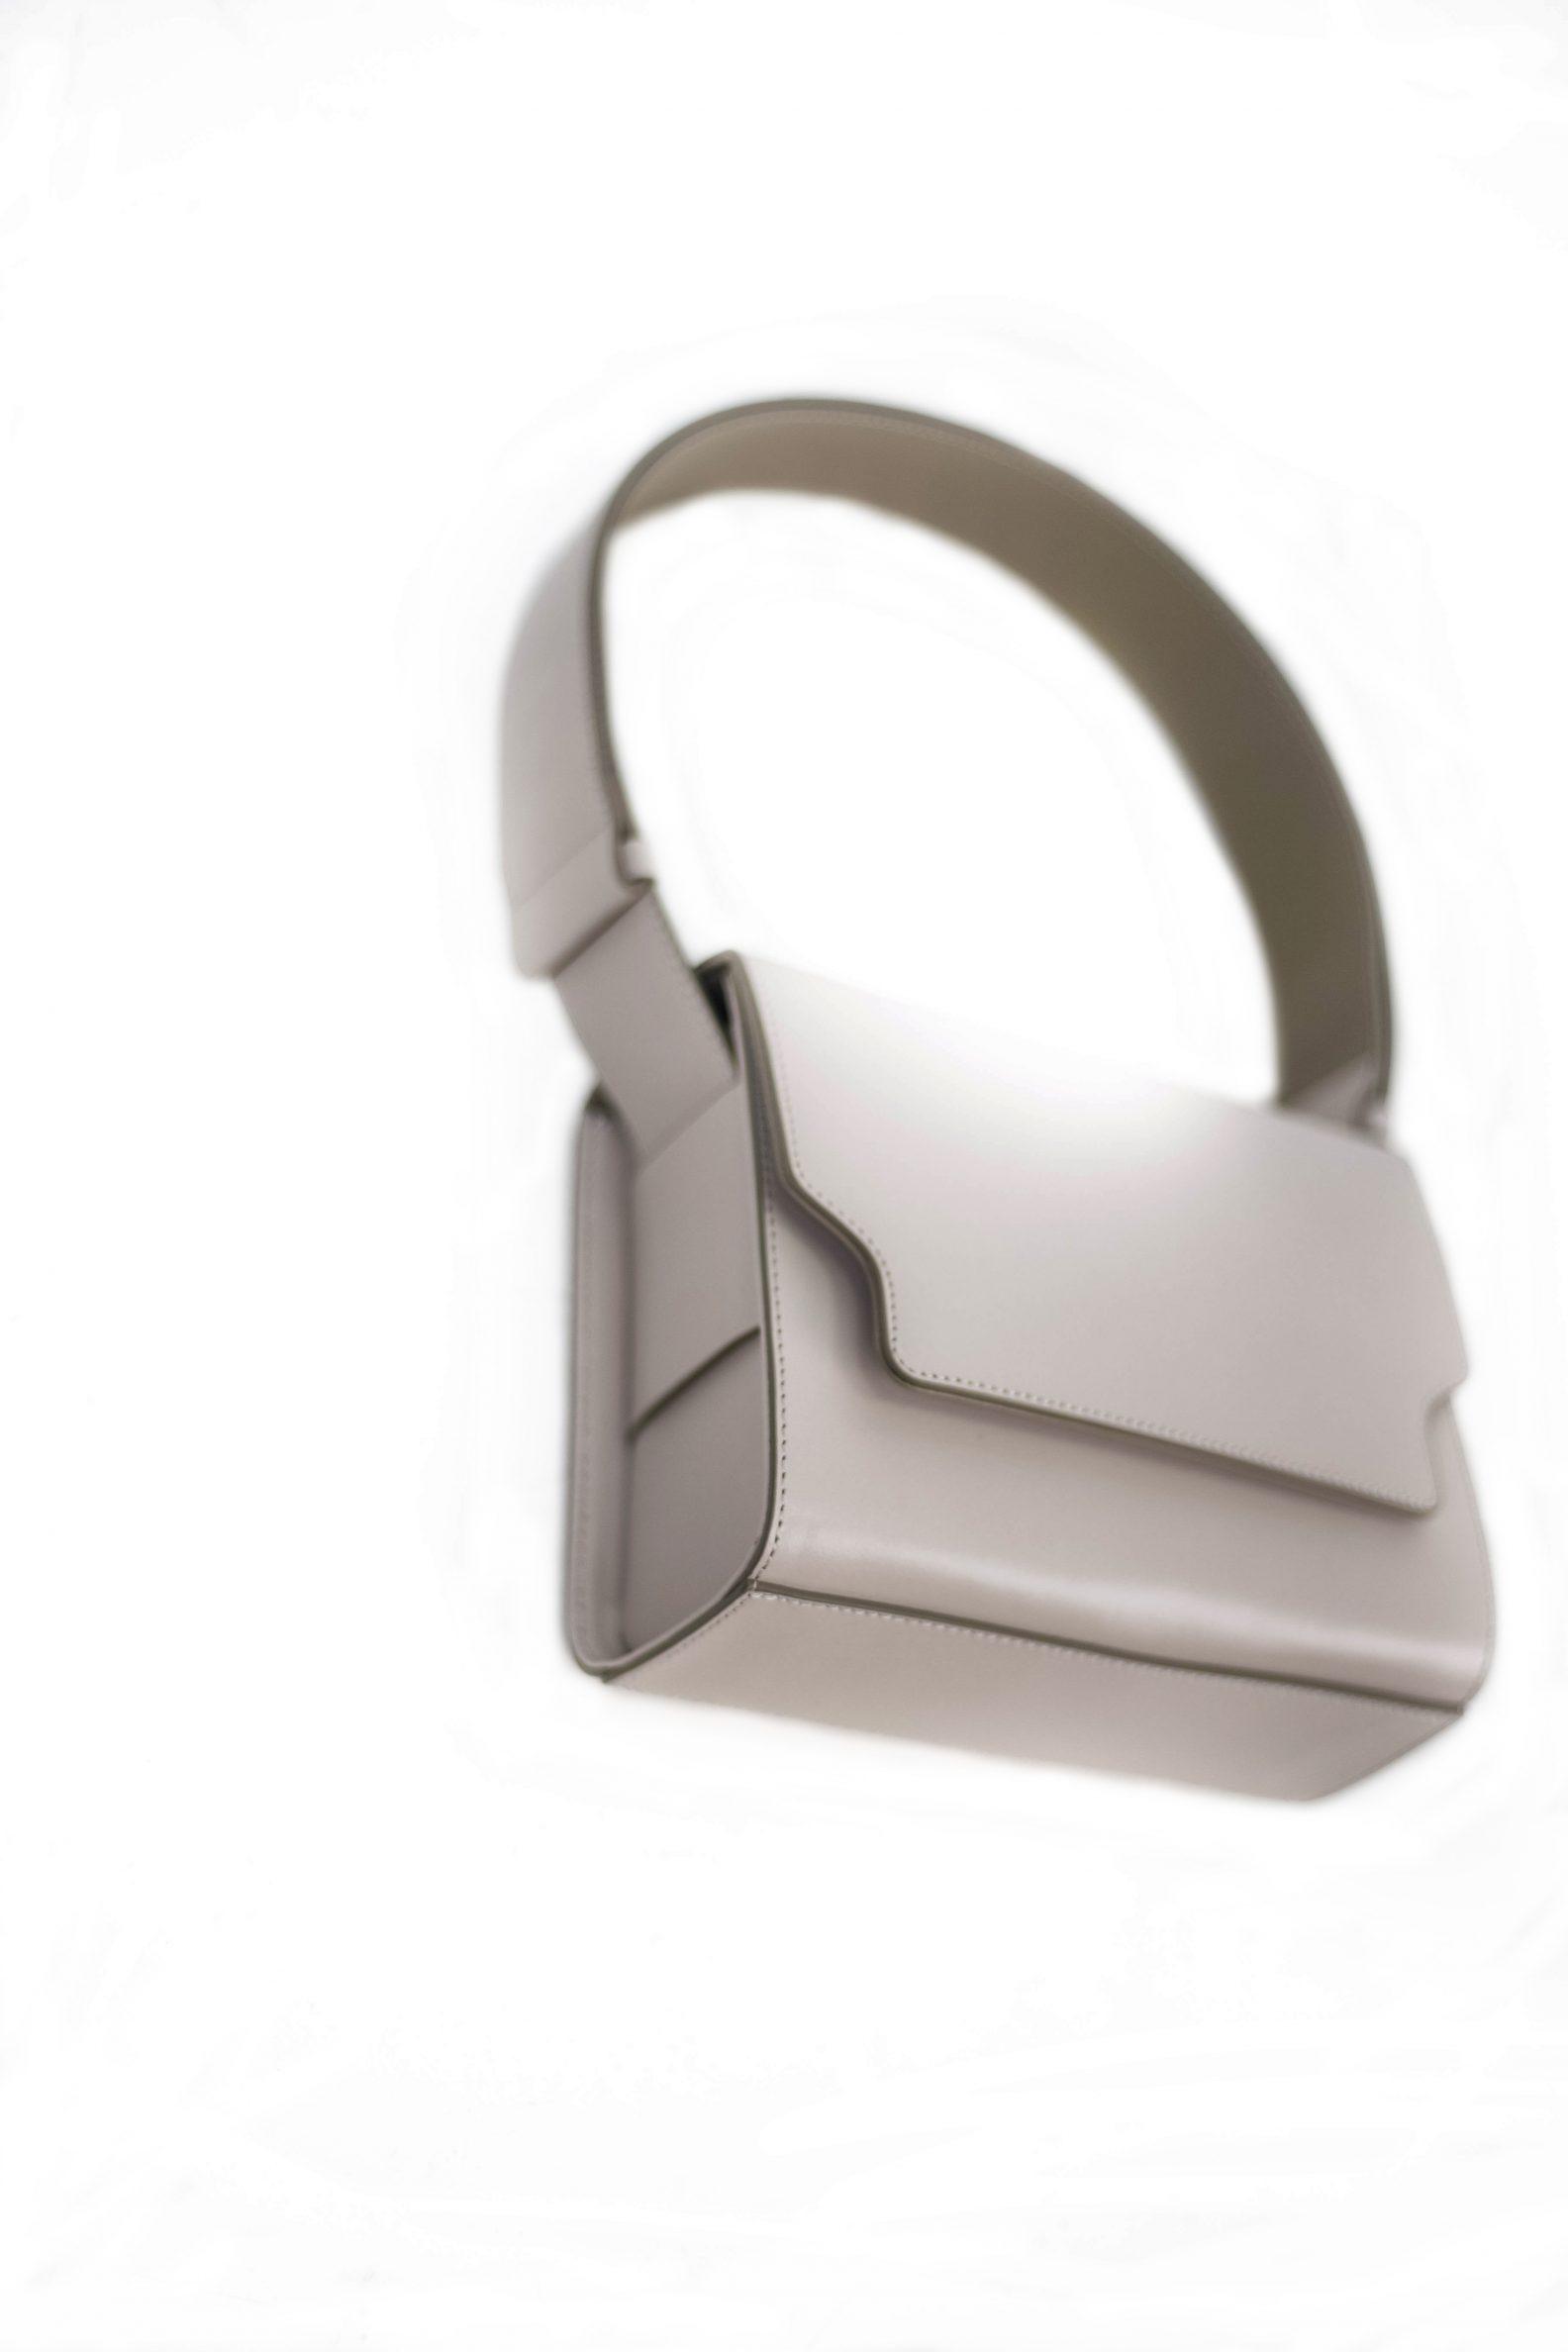 2-sac-cuir-rabat-gris-clair-affaires-etrangeres-paris-mode-coreenne-besides-kimchi-jpg ;